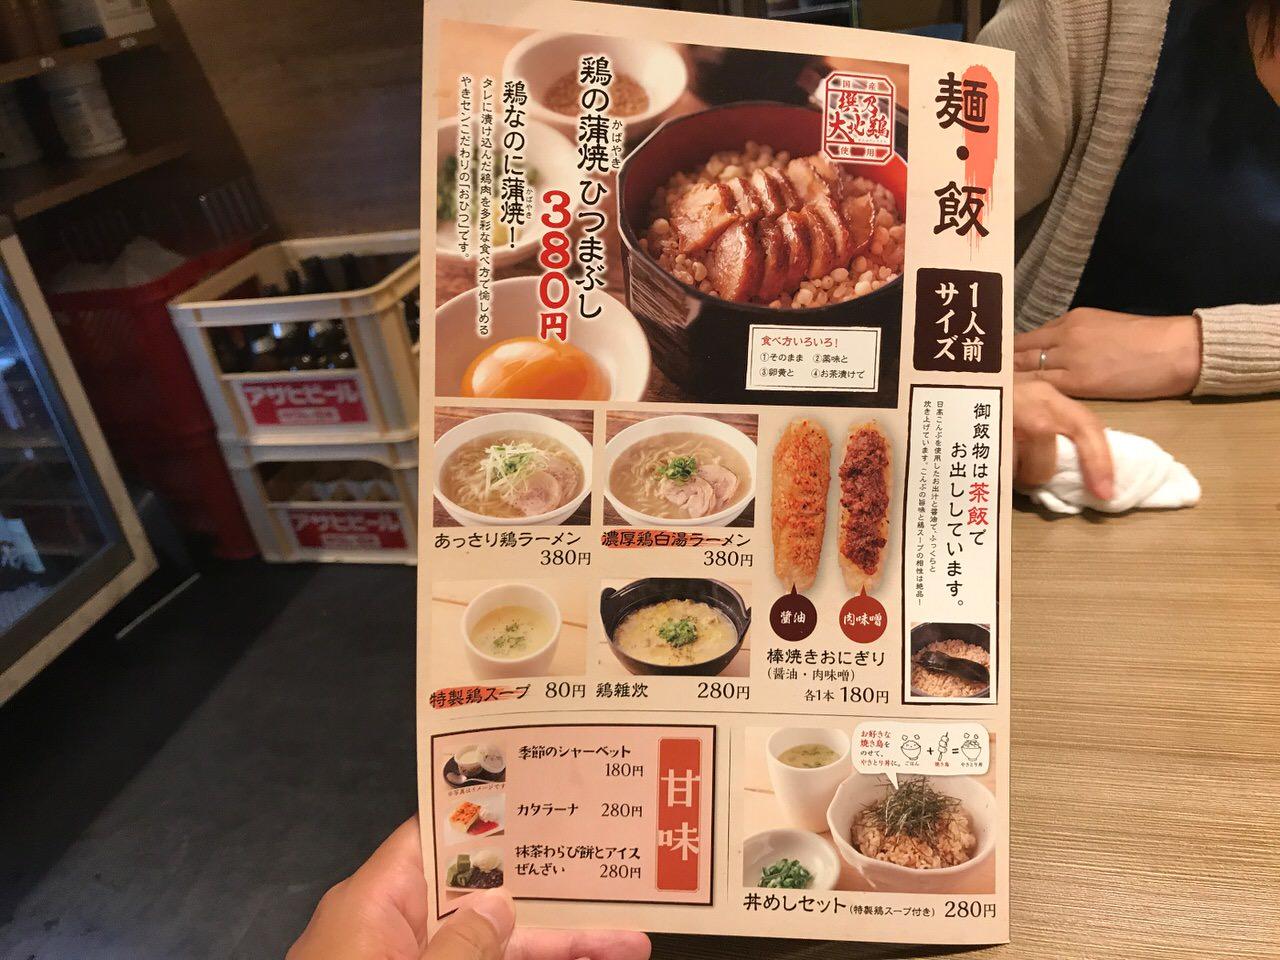 Yakitori center 3856